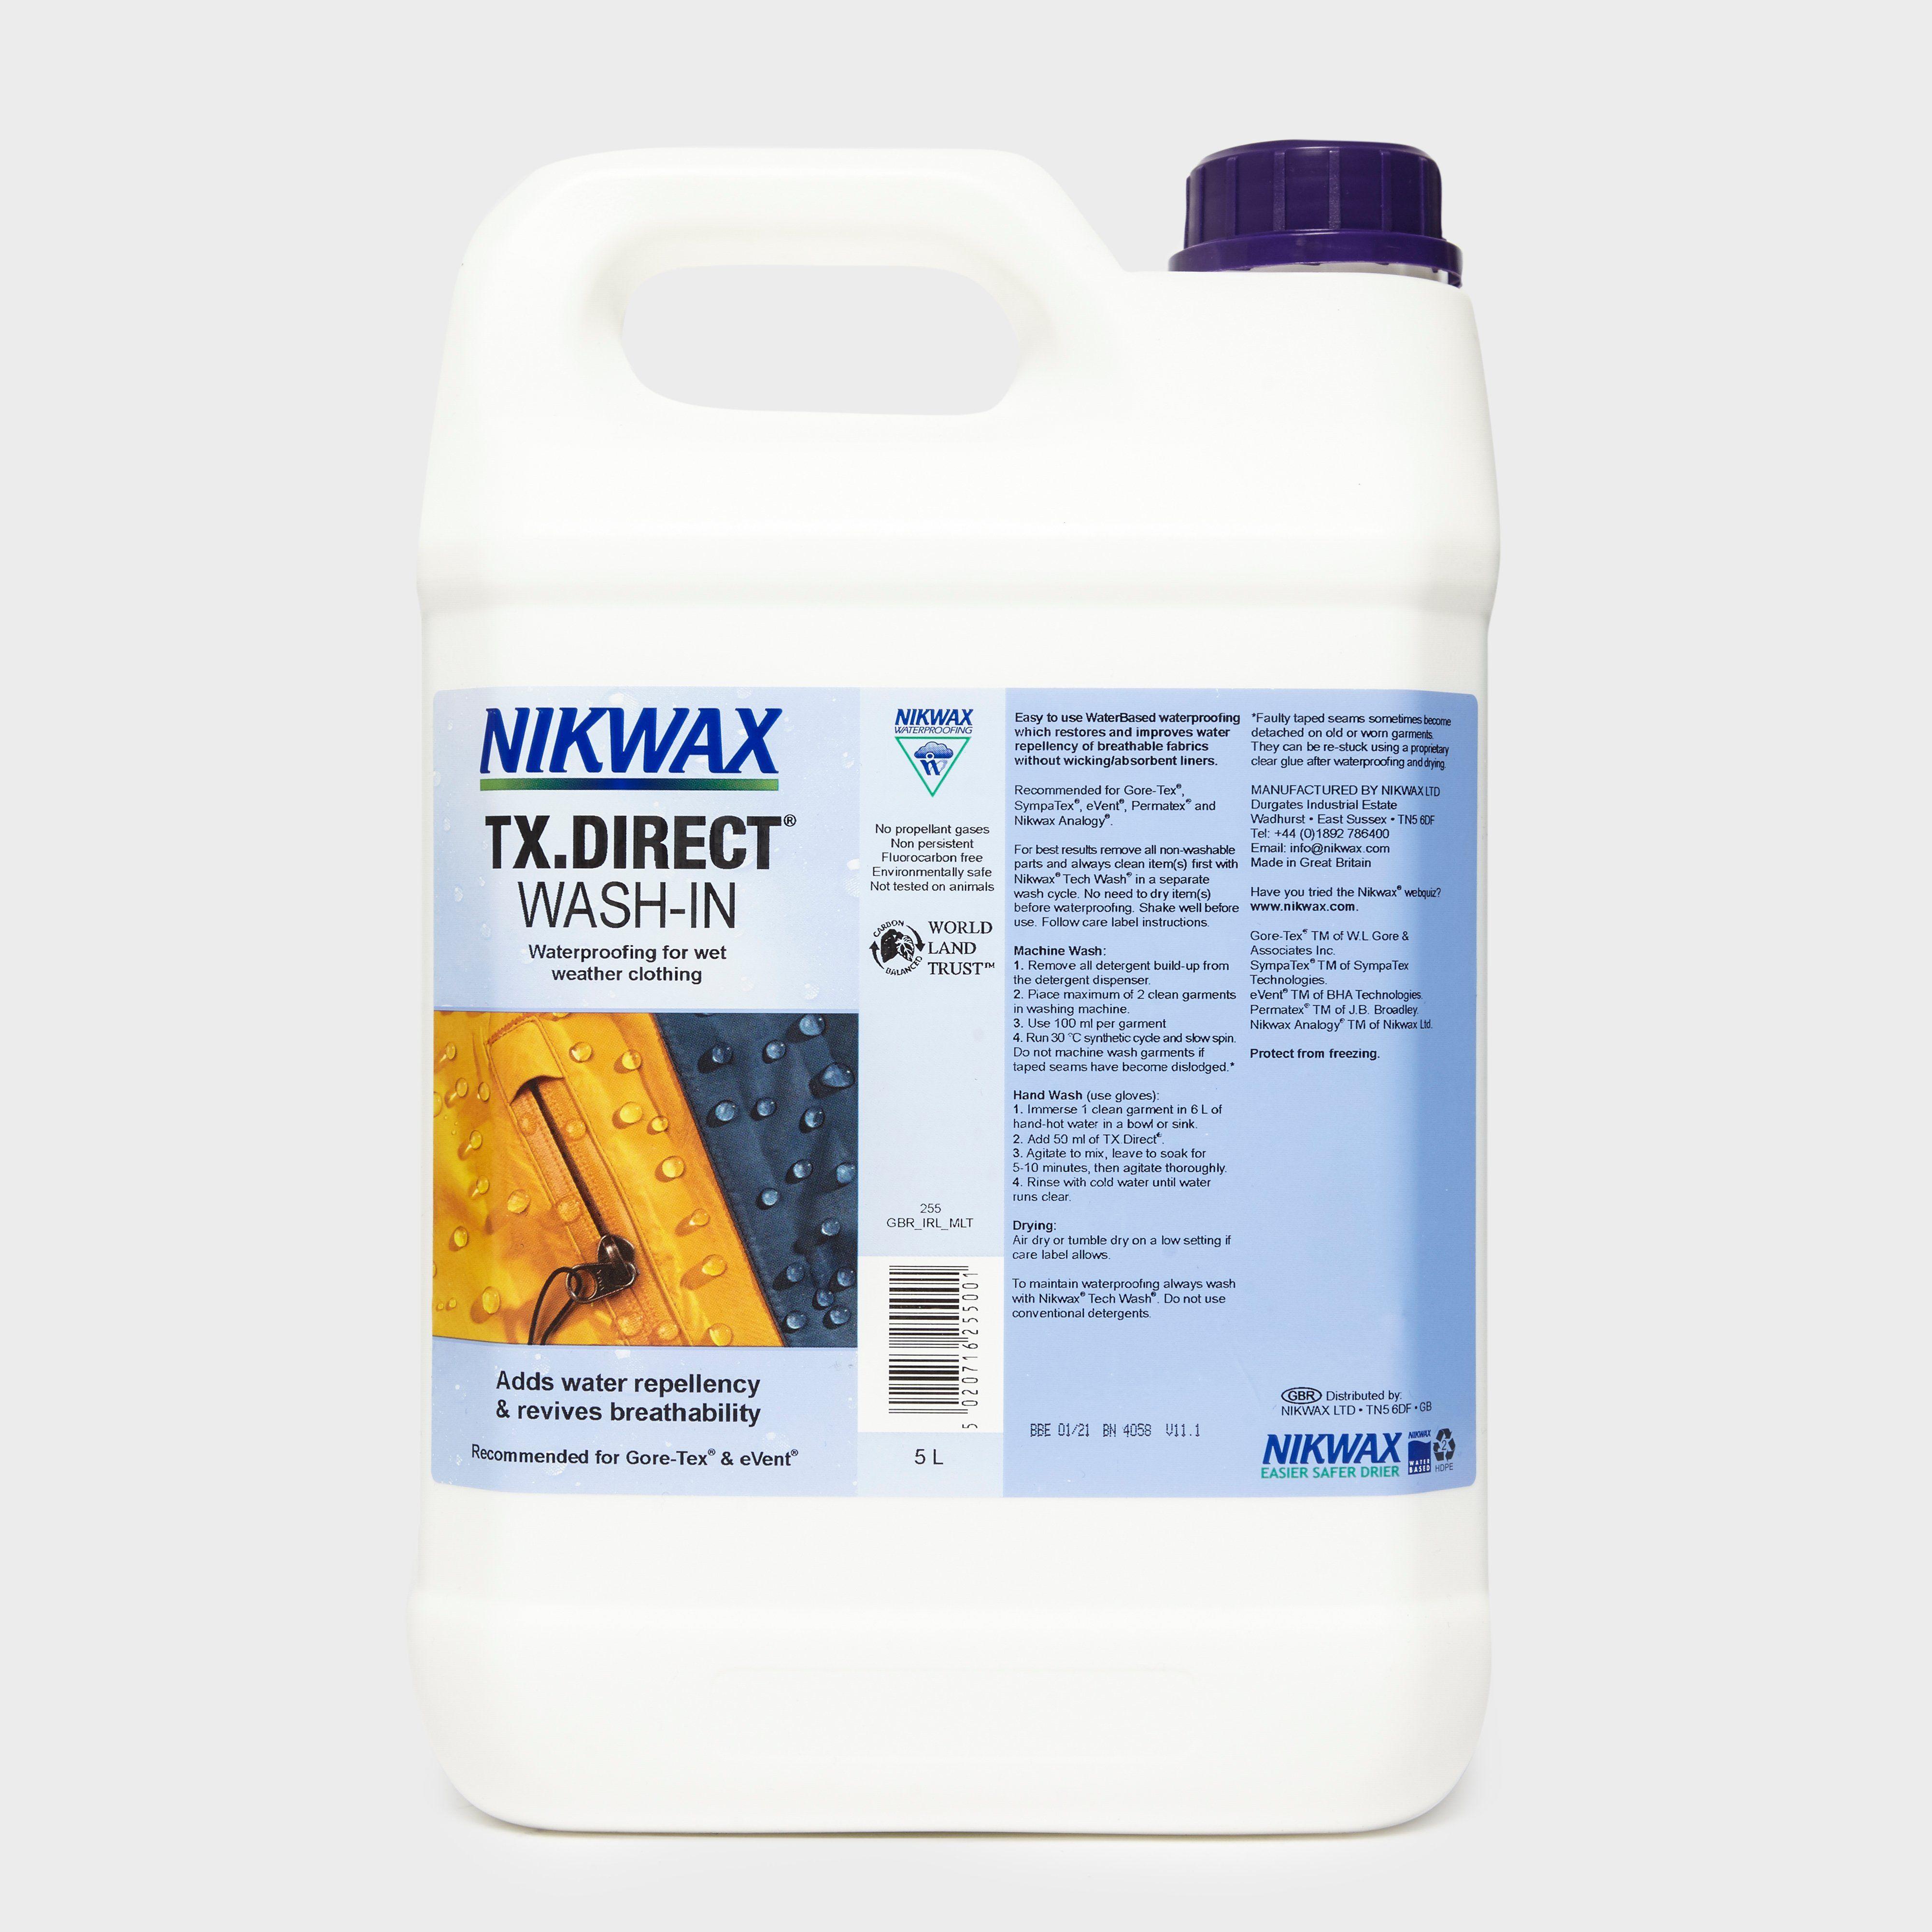 NIKWAX TX.Direct Wash-In 5L